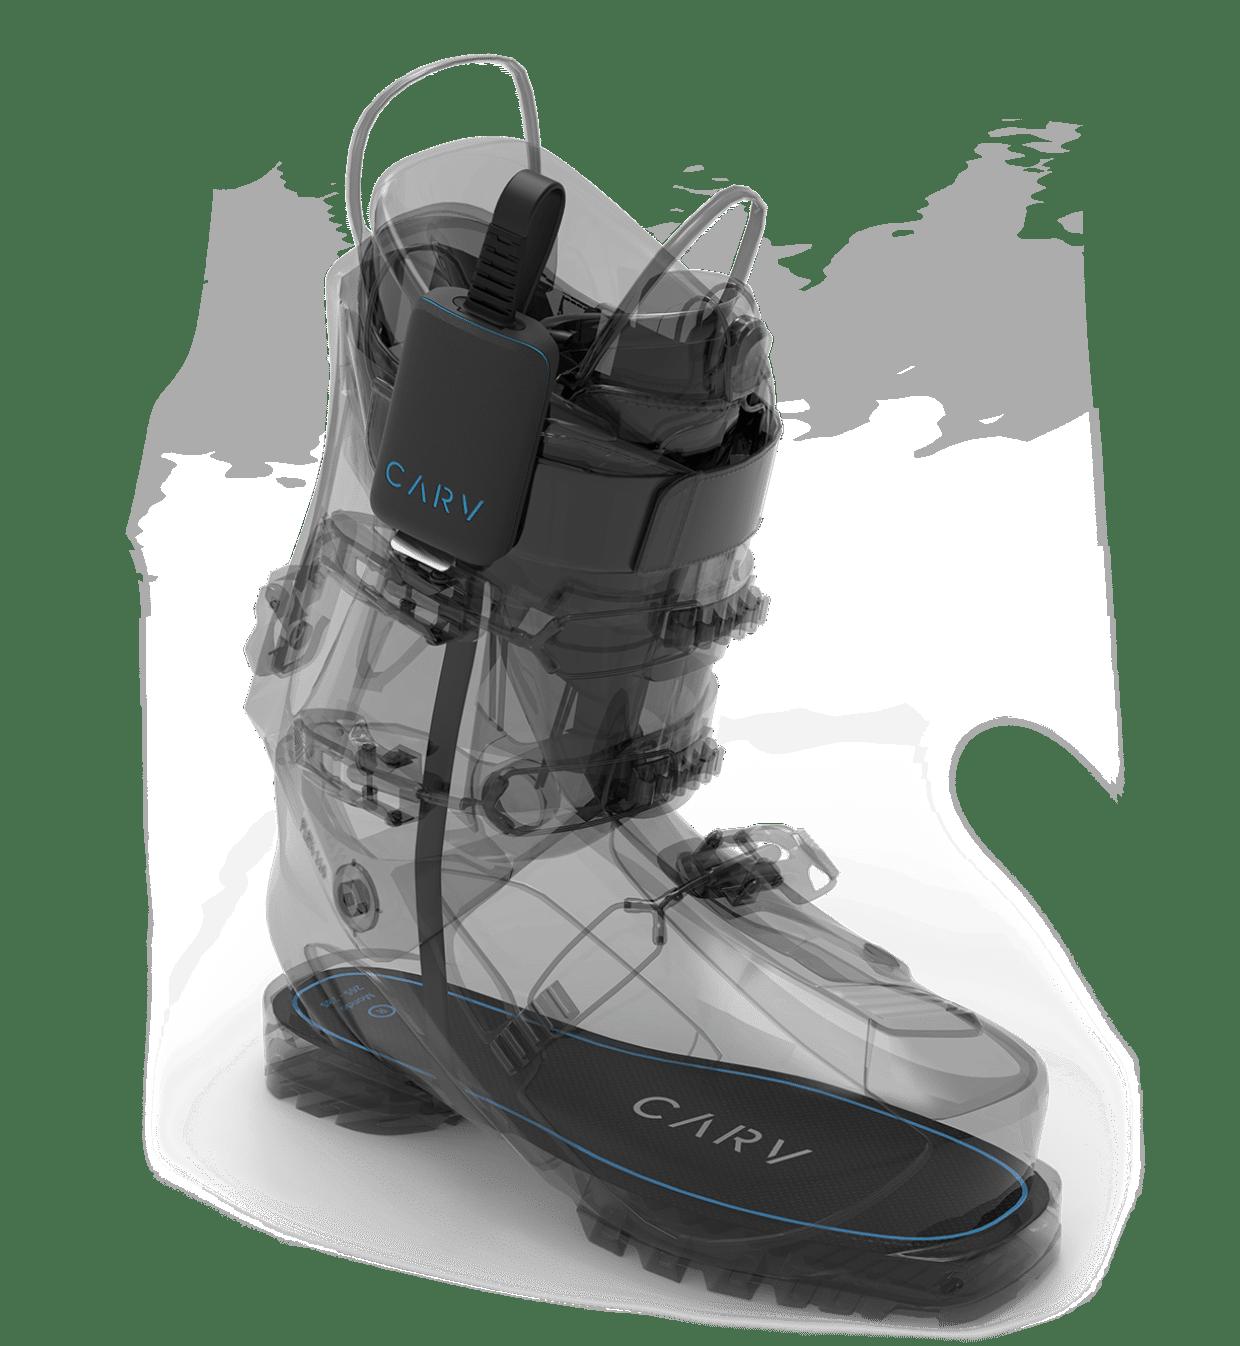 Ski Exchange Ltd Announces UK Exclusive Distribution Of CARV